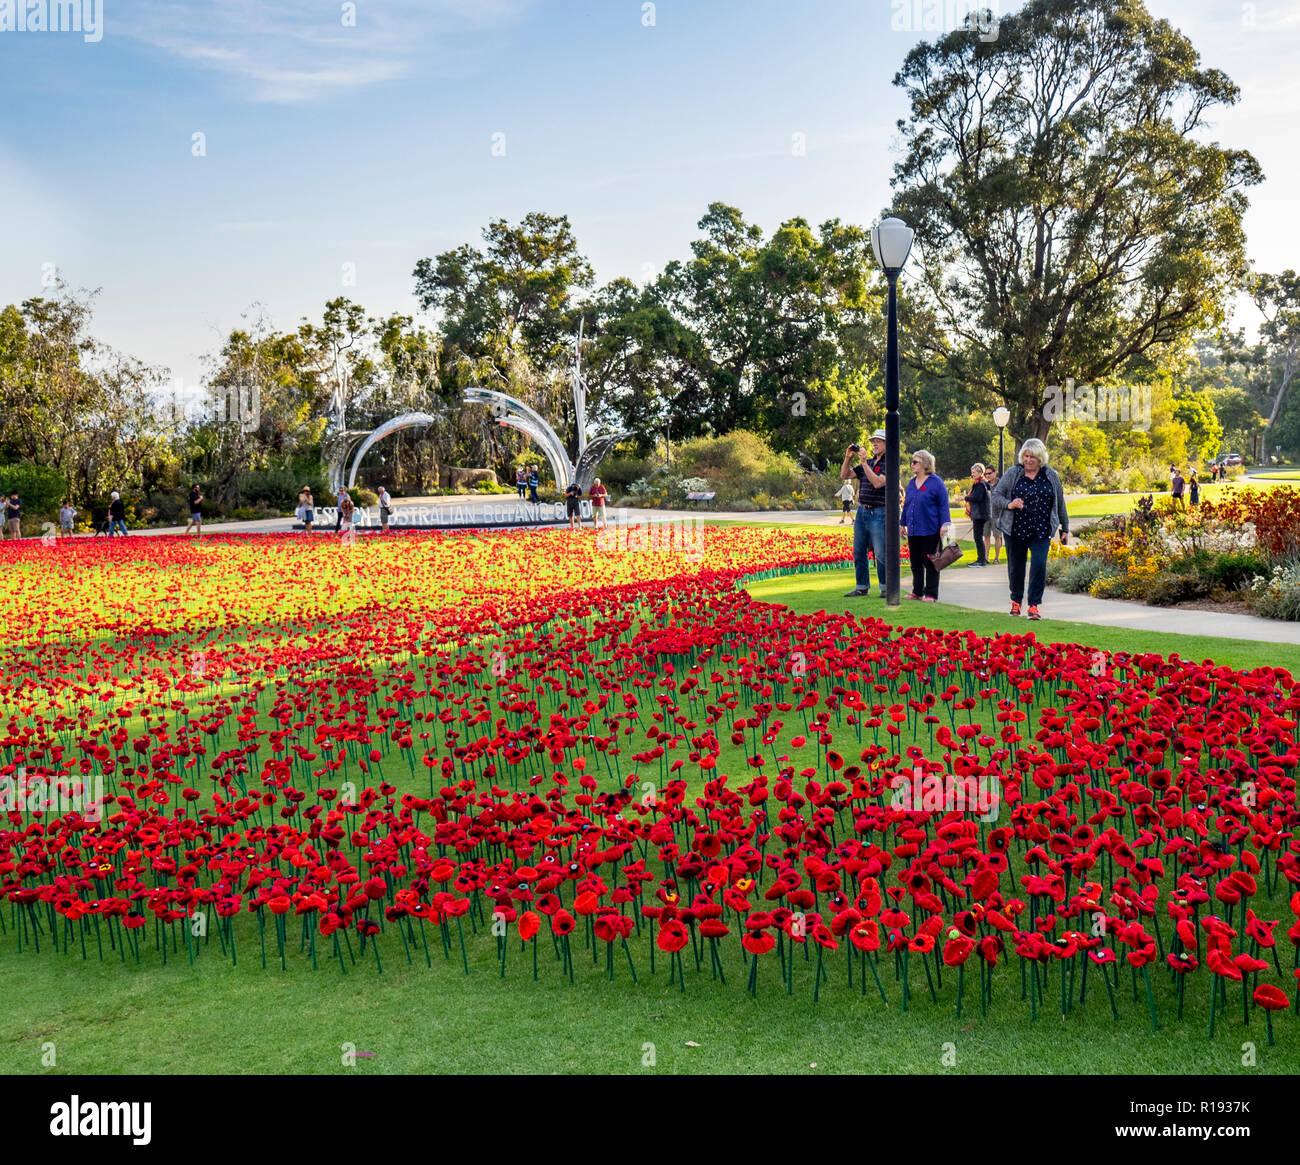 2018 Remembrance Day amapola mostrar Proyecto artesanal de amapola en el Parque Kings Perth Australia Occidental Foto de stock